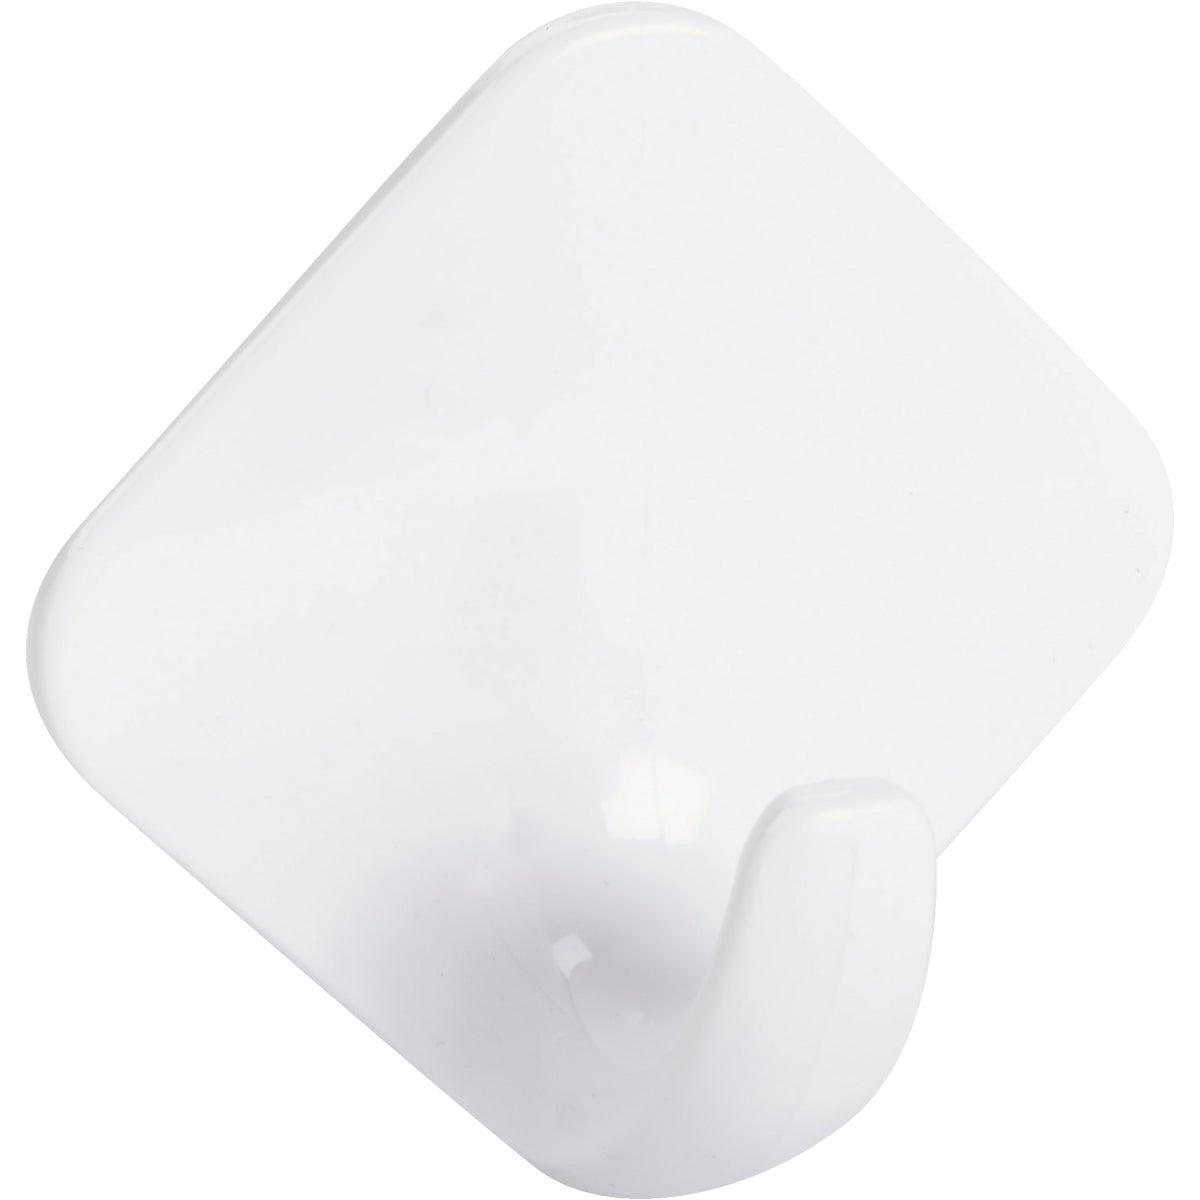 WHITE DIAMOND HOOK - 16001 by Interdesign Inc